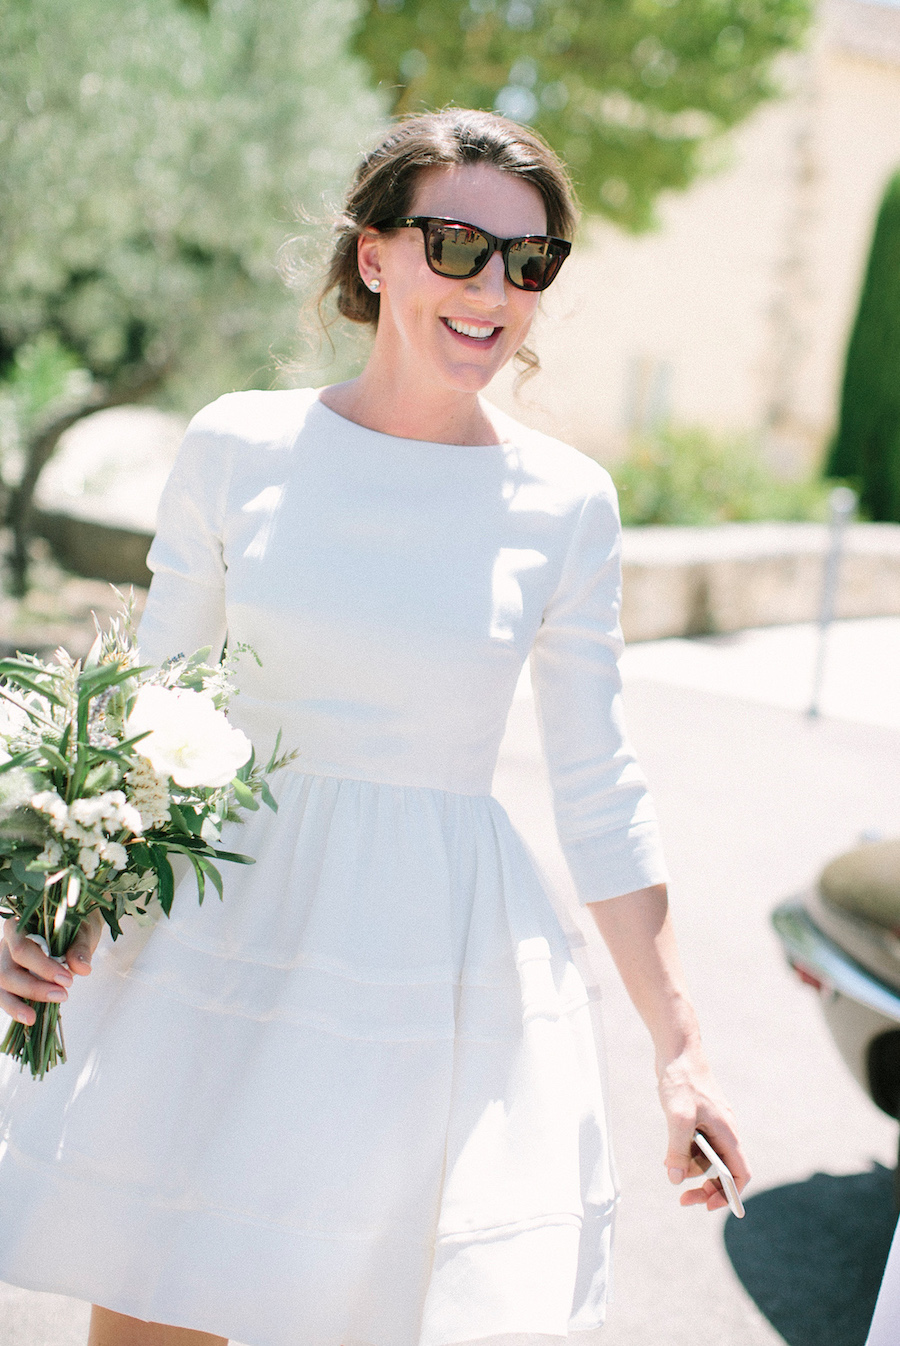 saya-photography-rustic-french-wedding-provence-domaines-de-patras-34.jpg